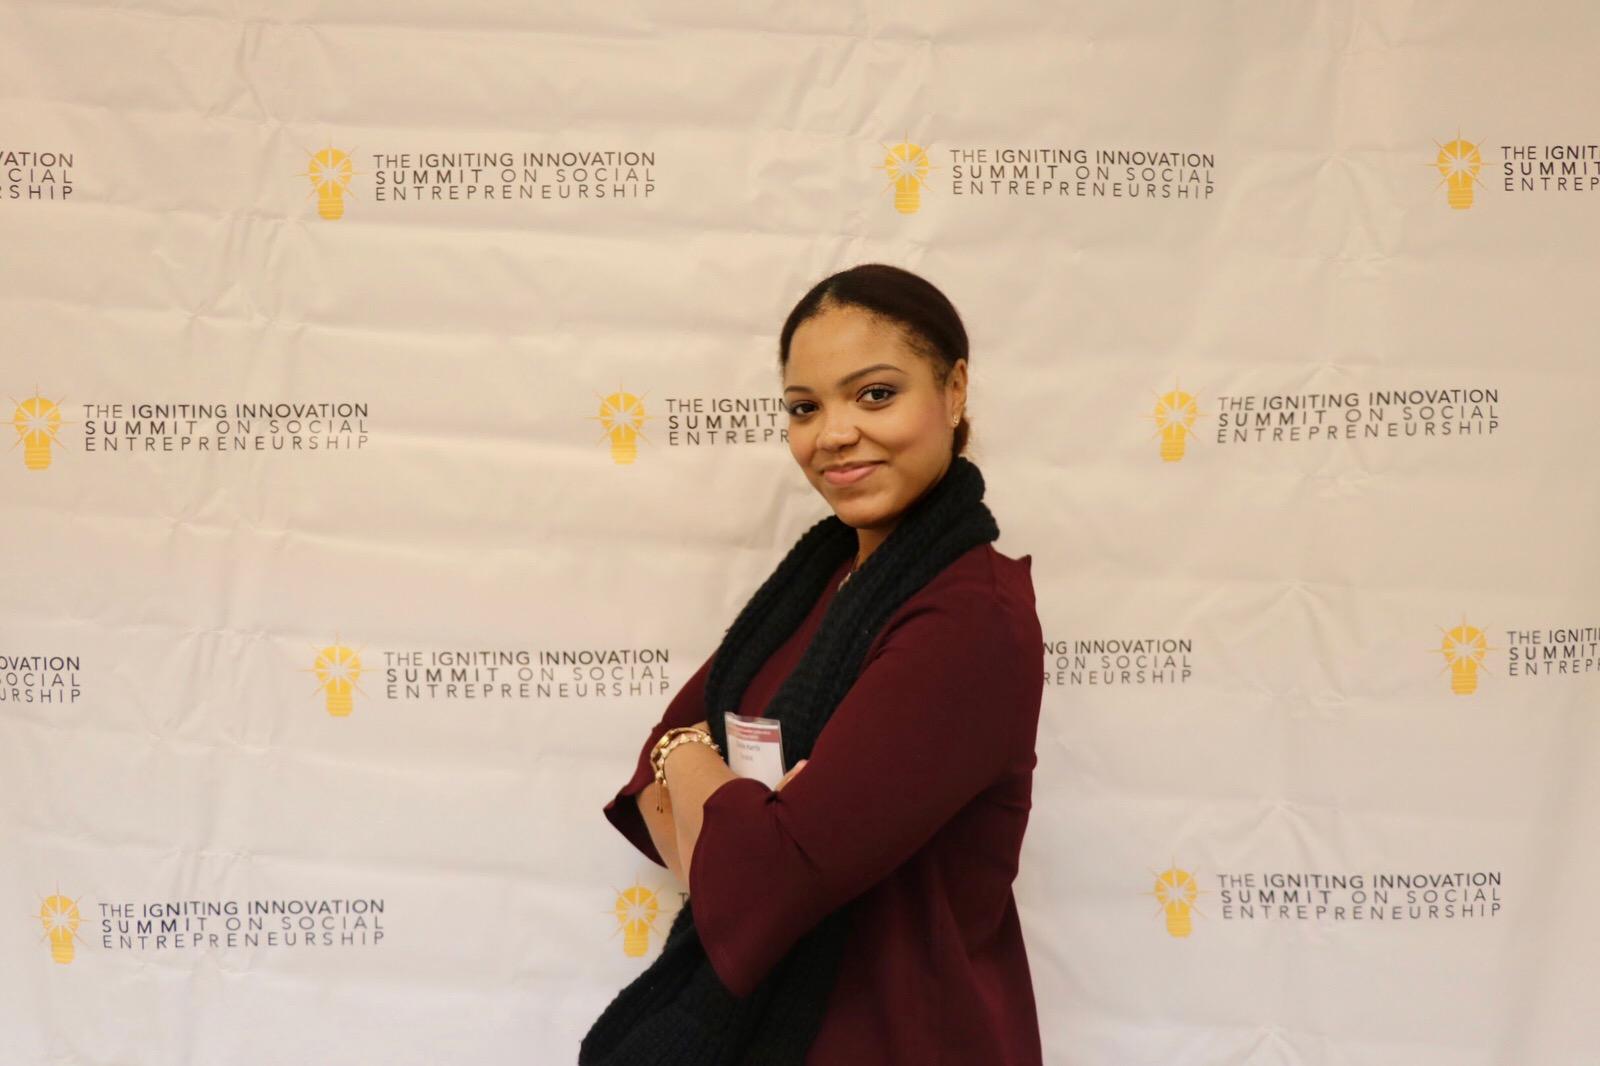 Chante Harris, Women Enews Pioneering Woman in Sustainability, Forbes Fellow, Vice President.  Follow her